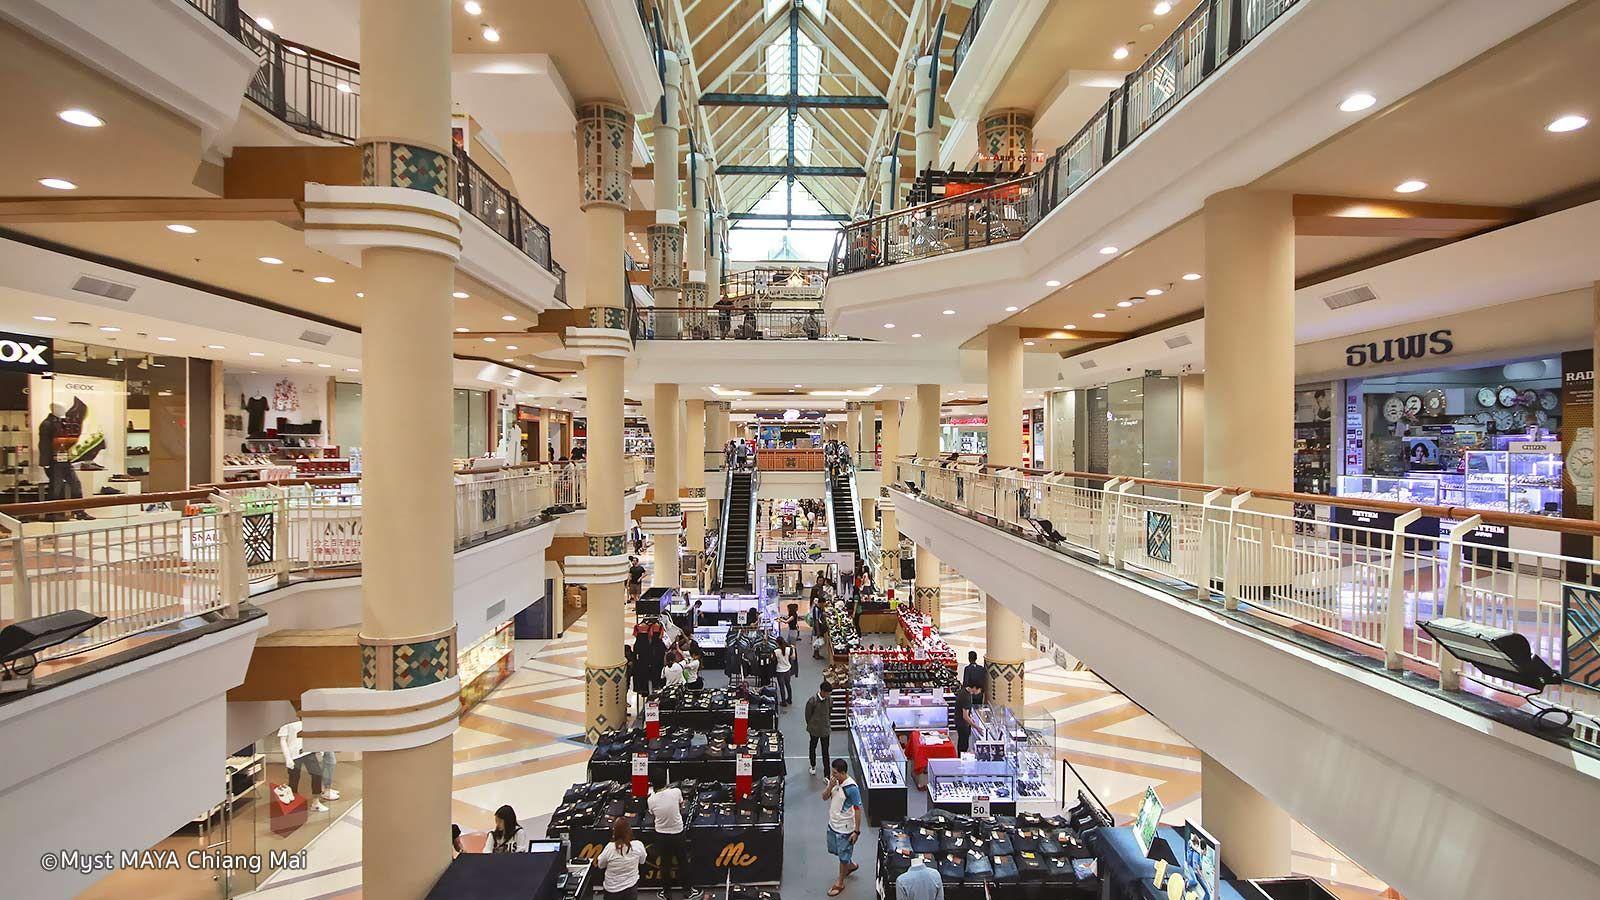 Home Design Outlet Center Miami In 2021 Mall Design House Design Shopping Mall Interior